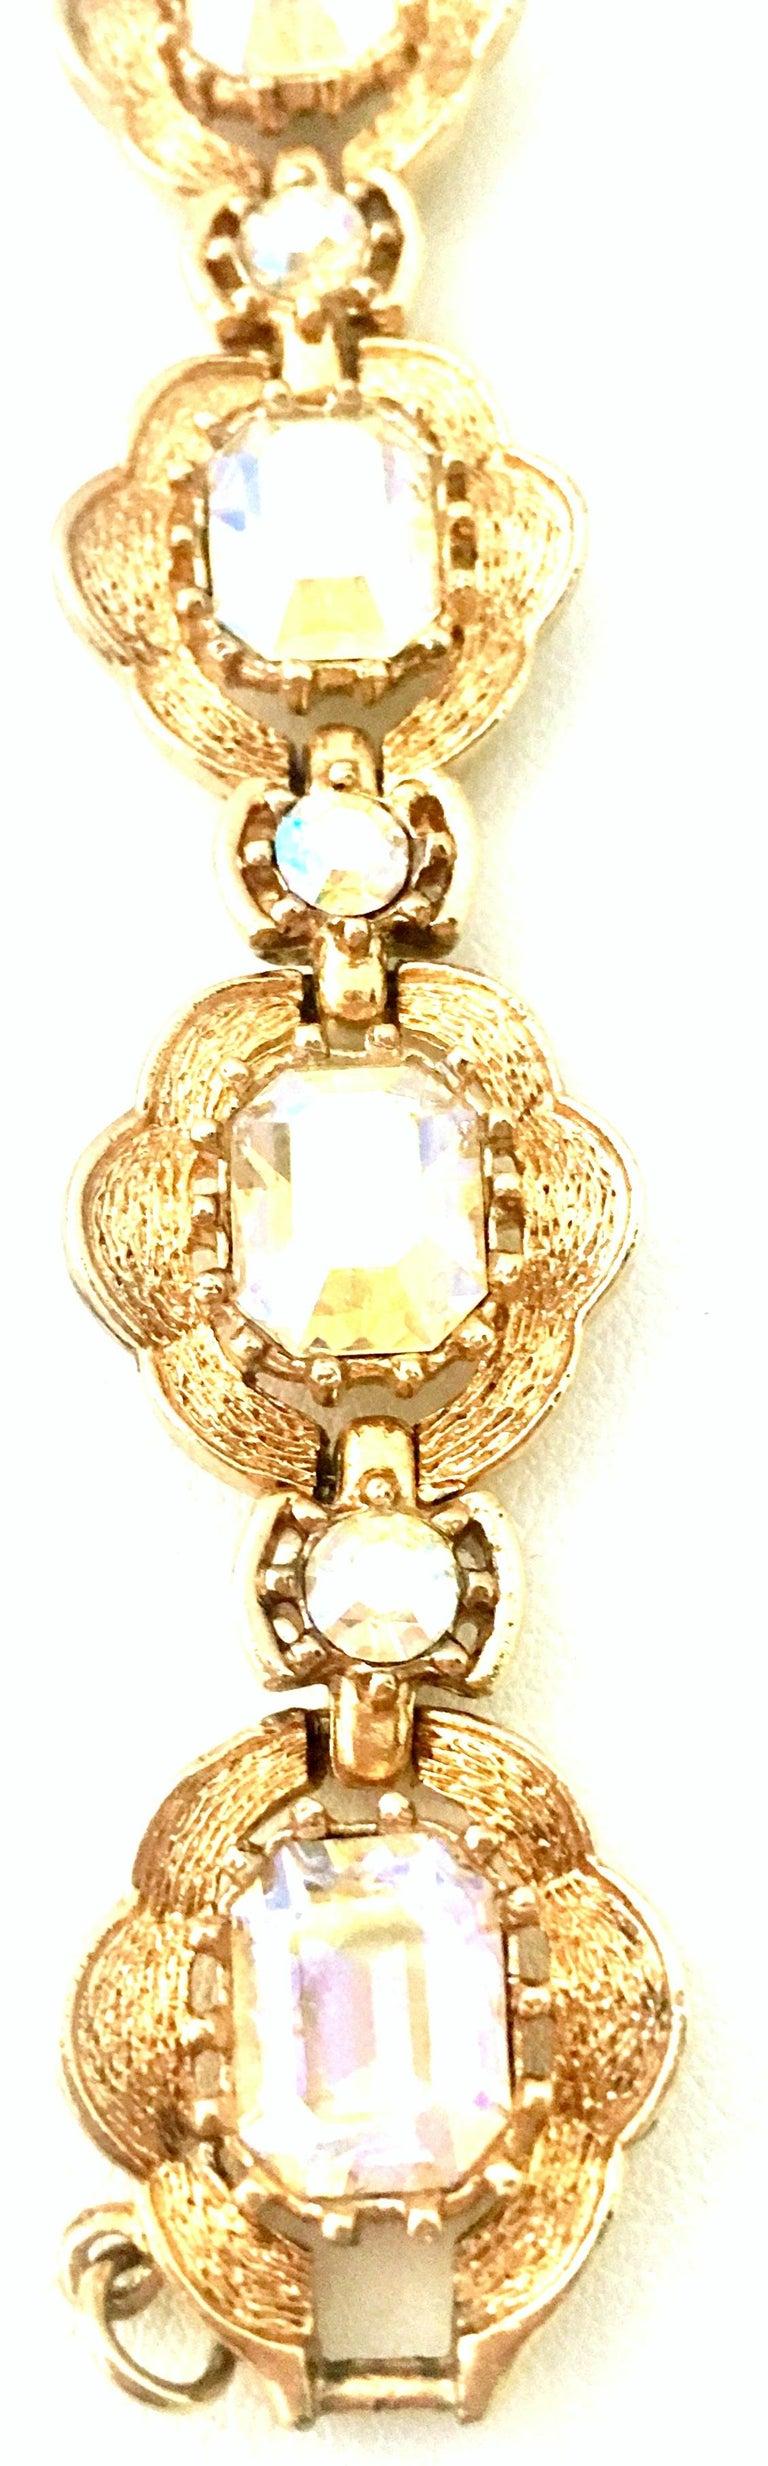 20th Century Gold & Swarovski Crystal Link Style Bracelet By, Coro For Sale 2